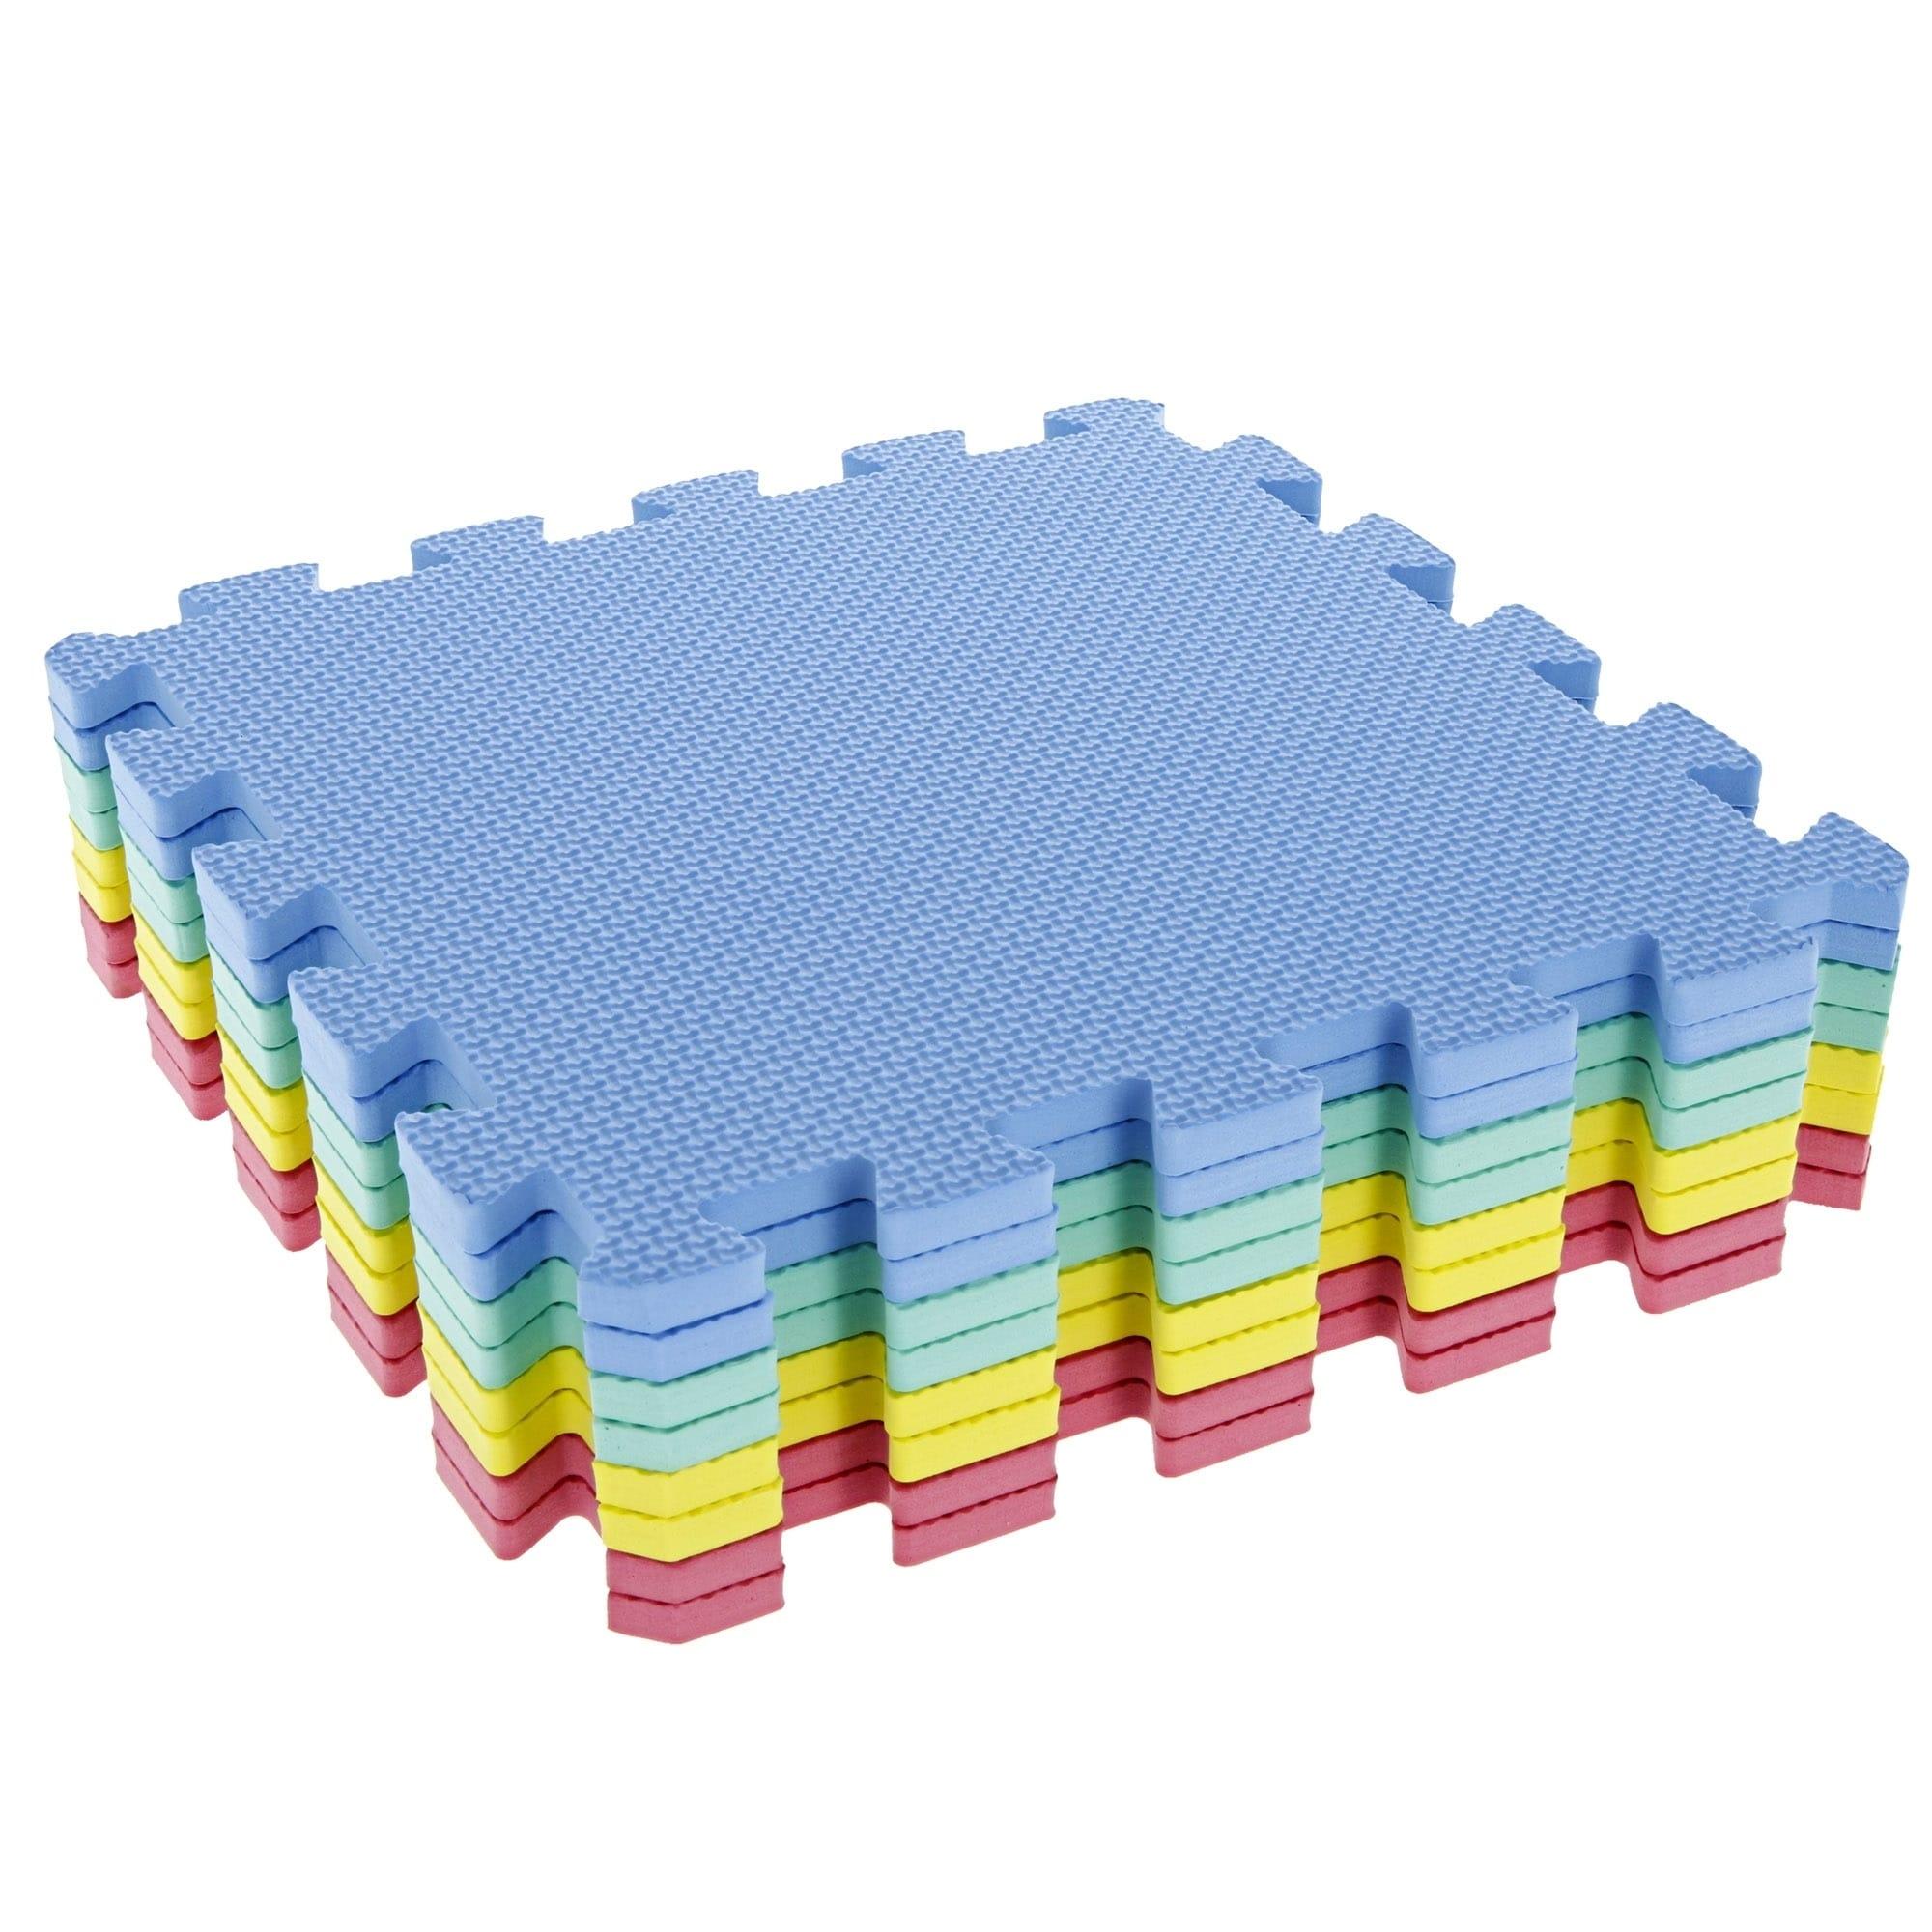 design tilesmototile magnificent garage interiors flooring of mats foam floor tiles fresh mototile best interlocking